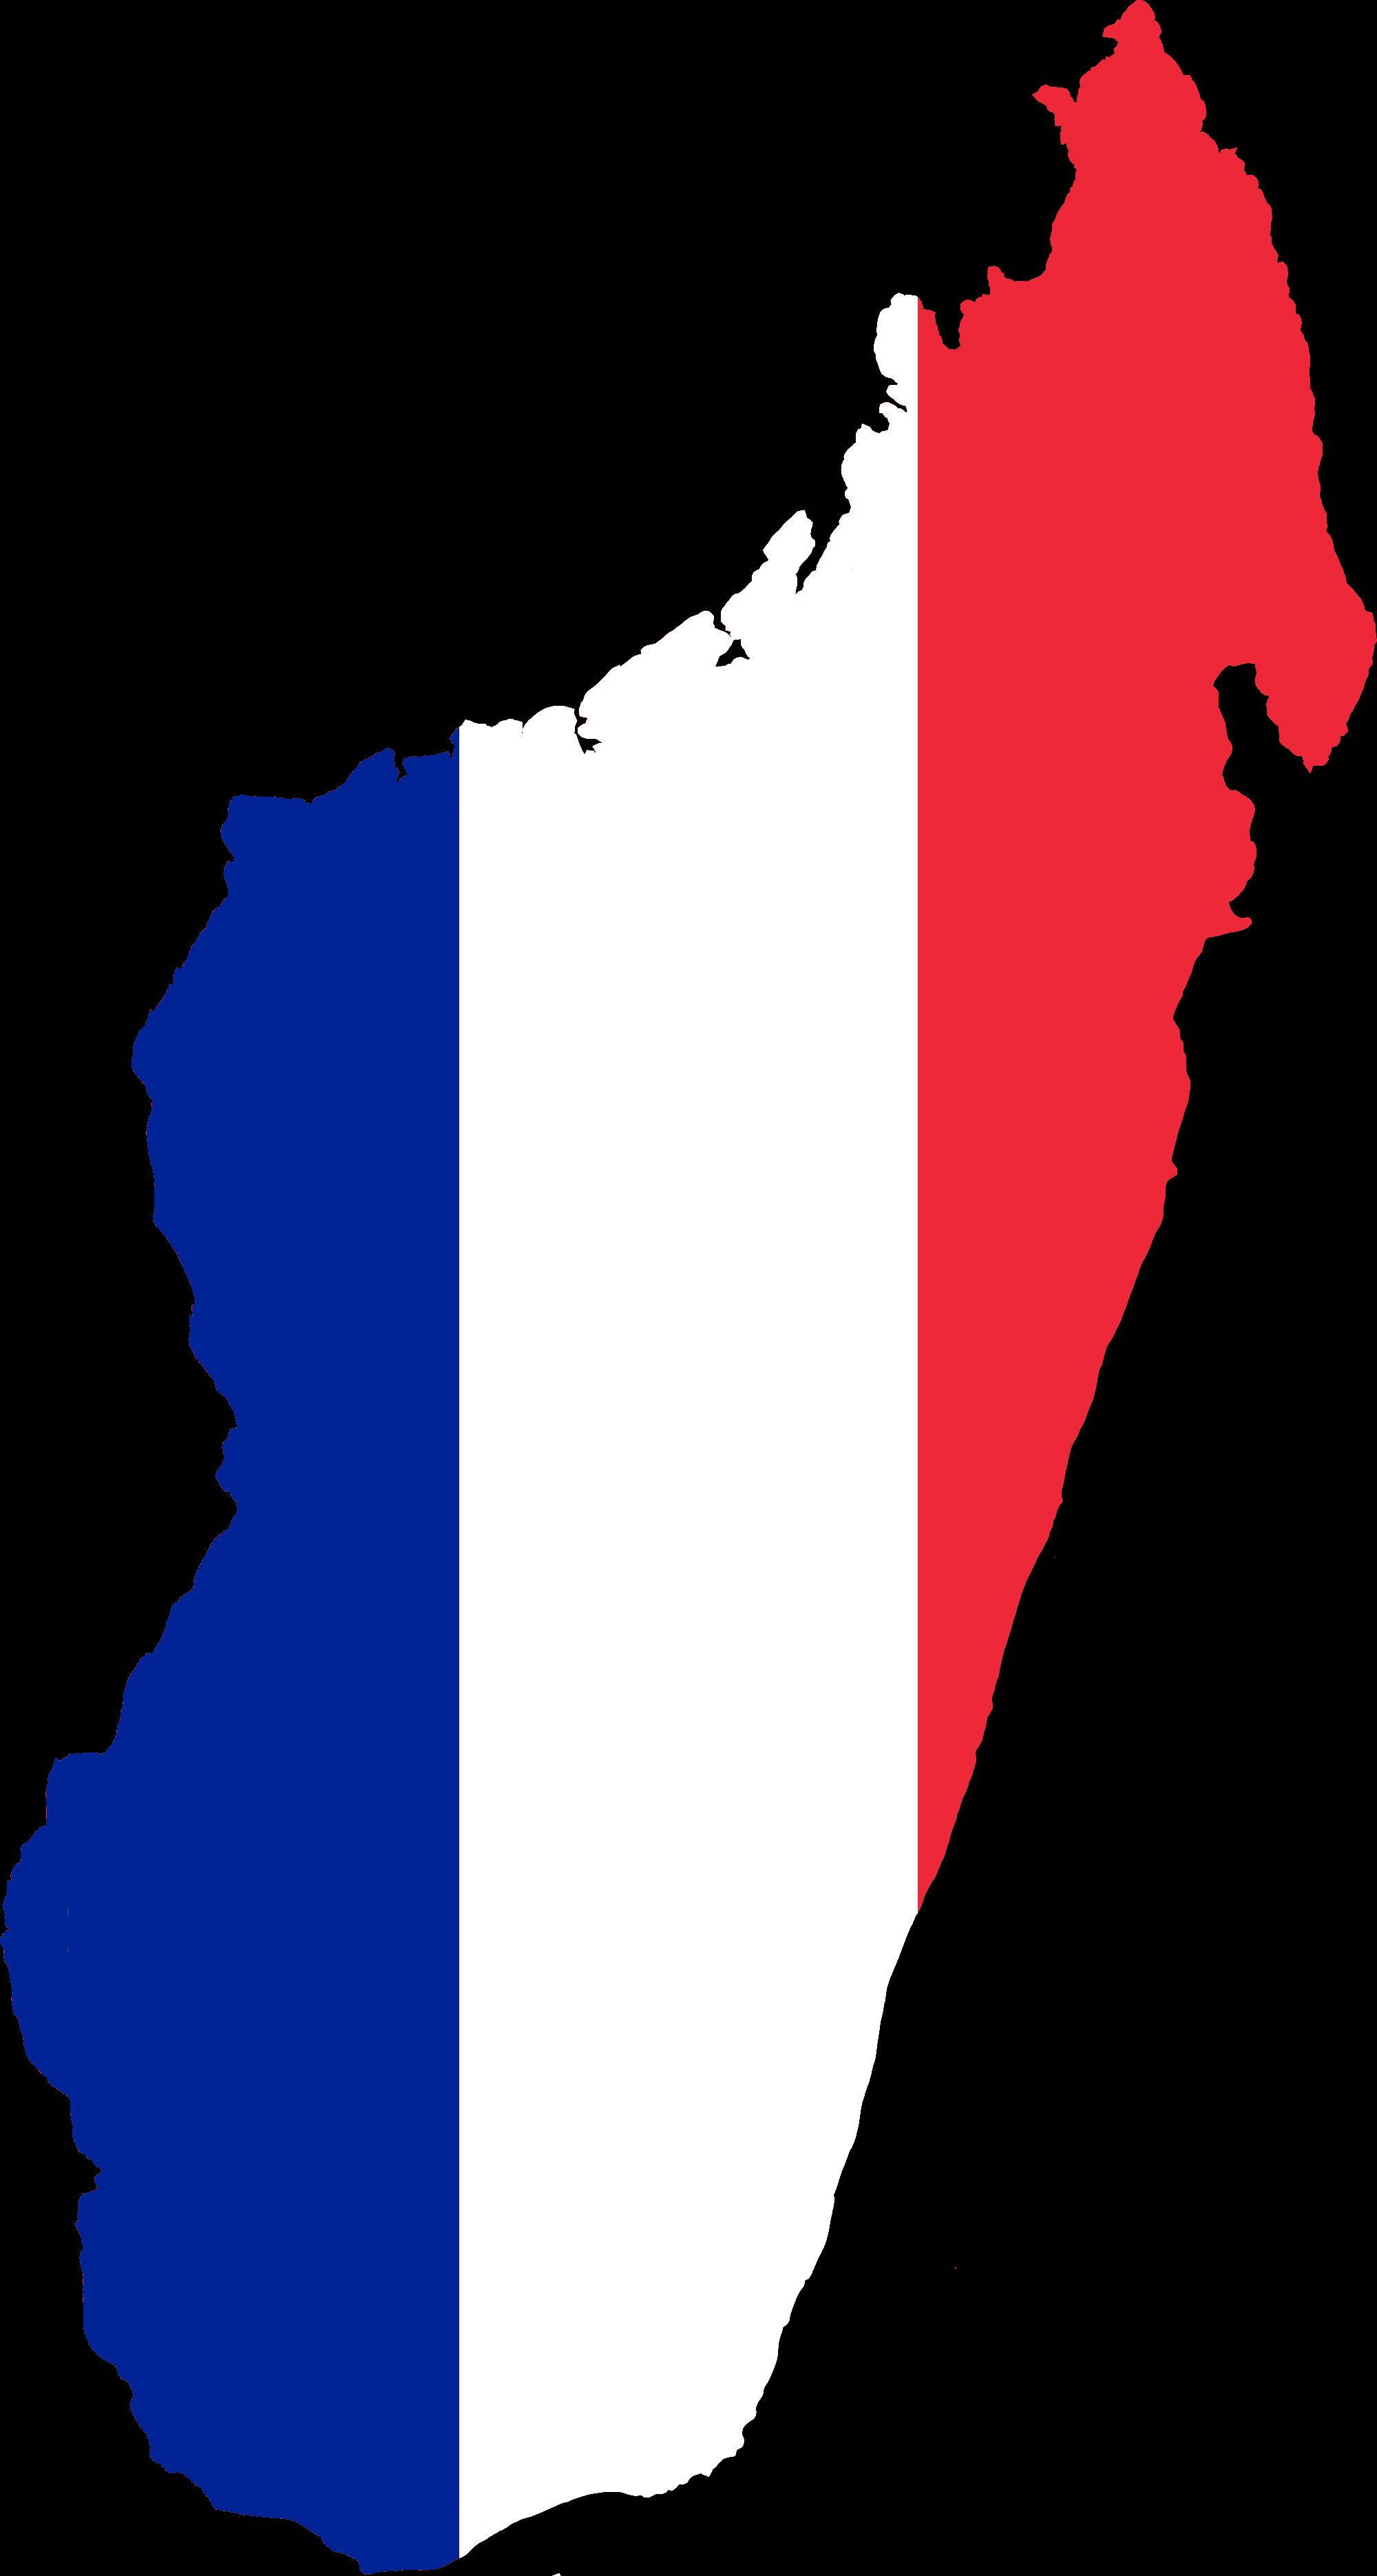 FileFlag Map Of French Madagascar Png Wikimedia - Madagascar flag